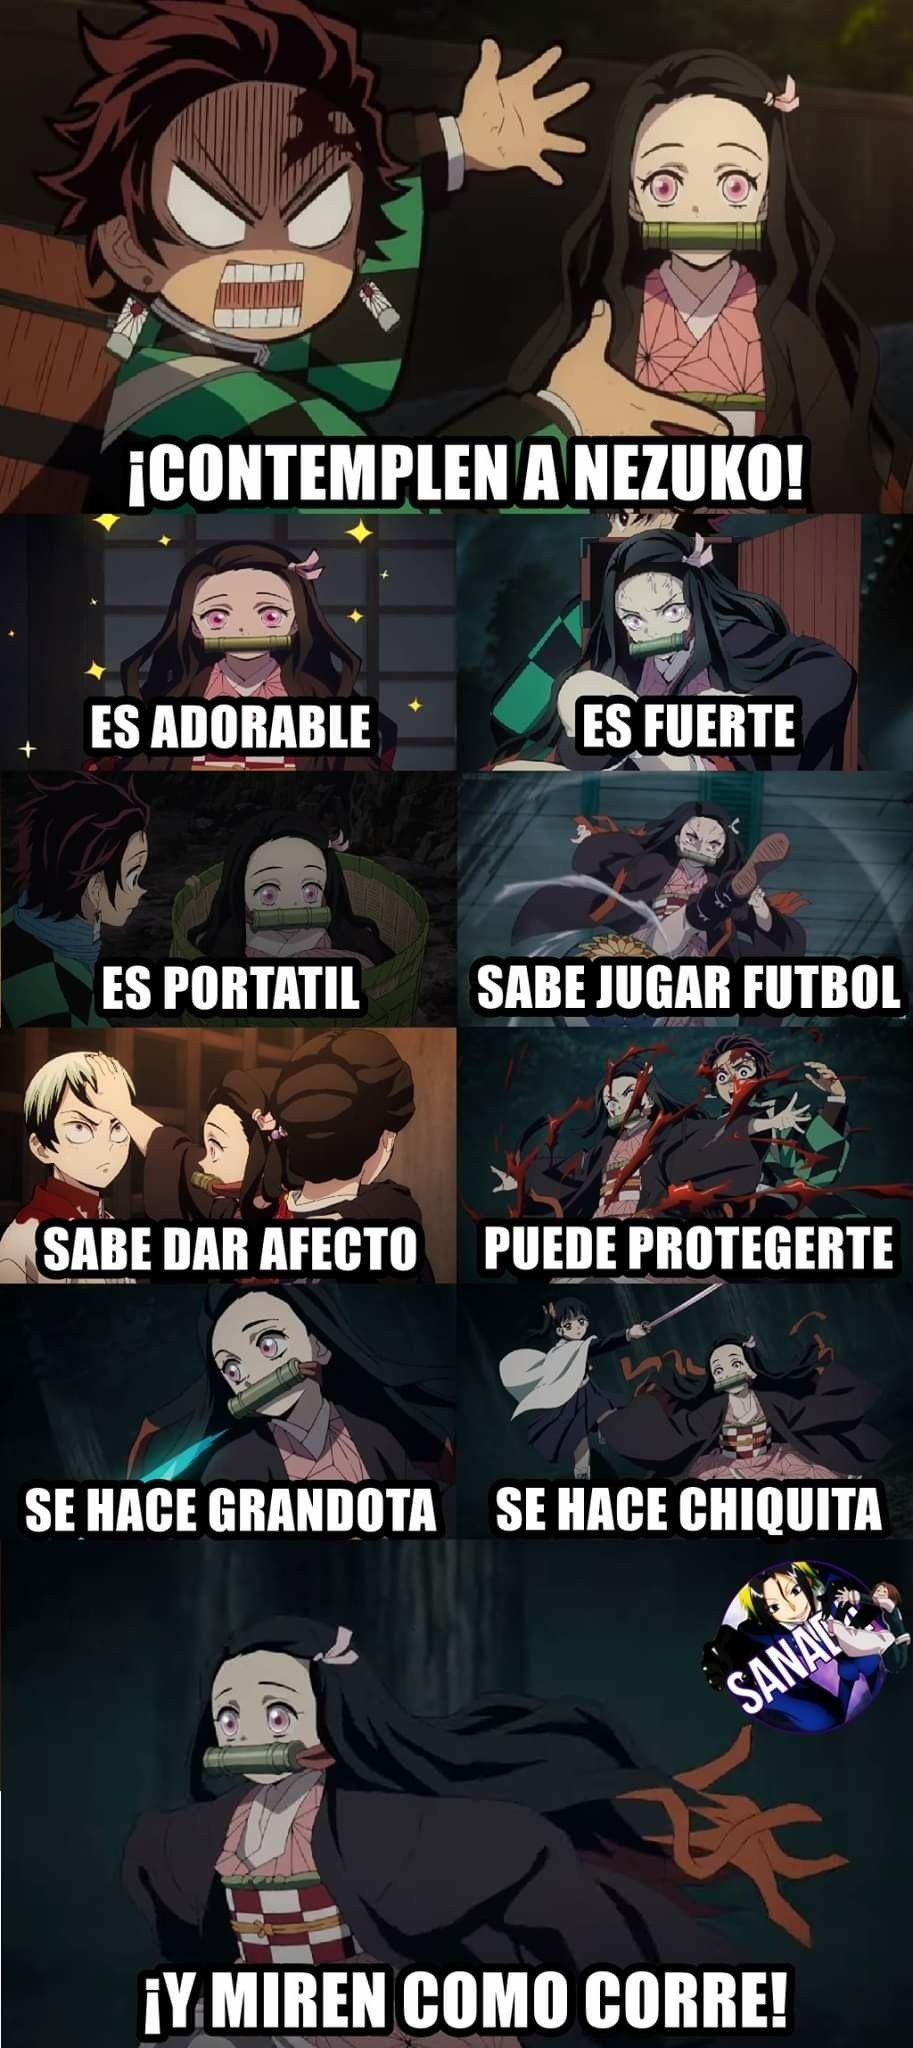 Anime Kimetsu no Yaiba! Memes de anime, Memes